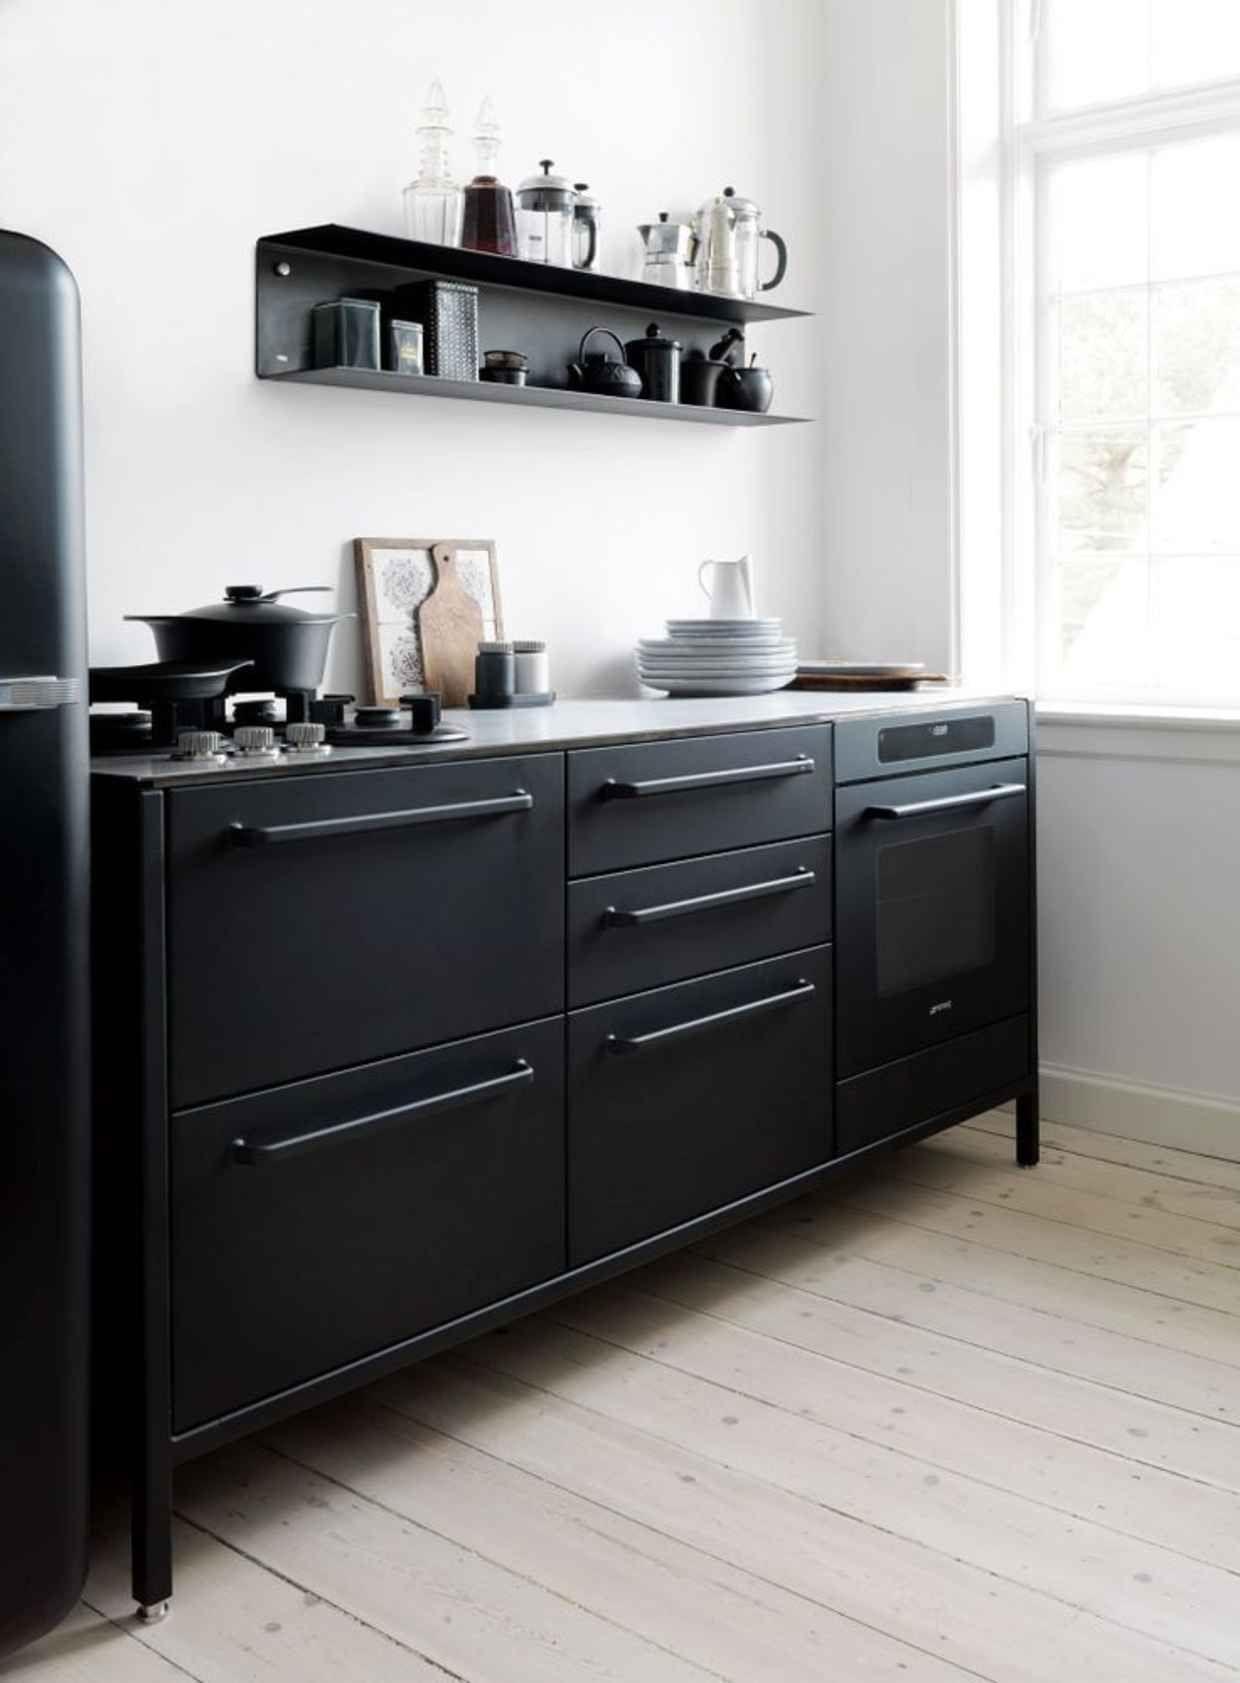 20 Examples Of Minimal Interior Design 23 Kitchen Interior Kitchen Inspirations Modern Kitchen